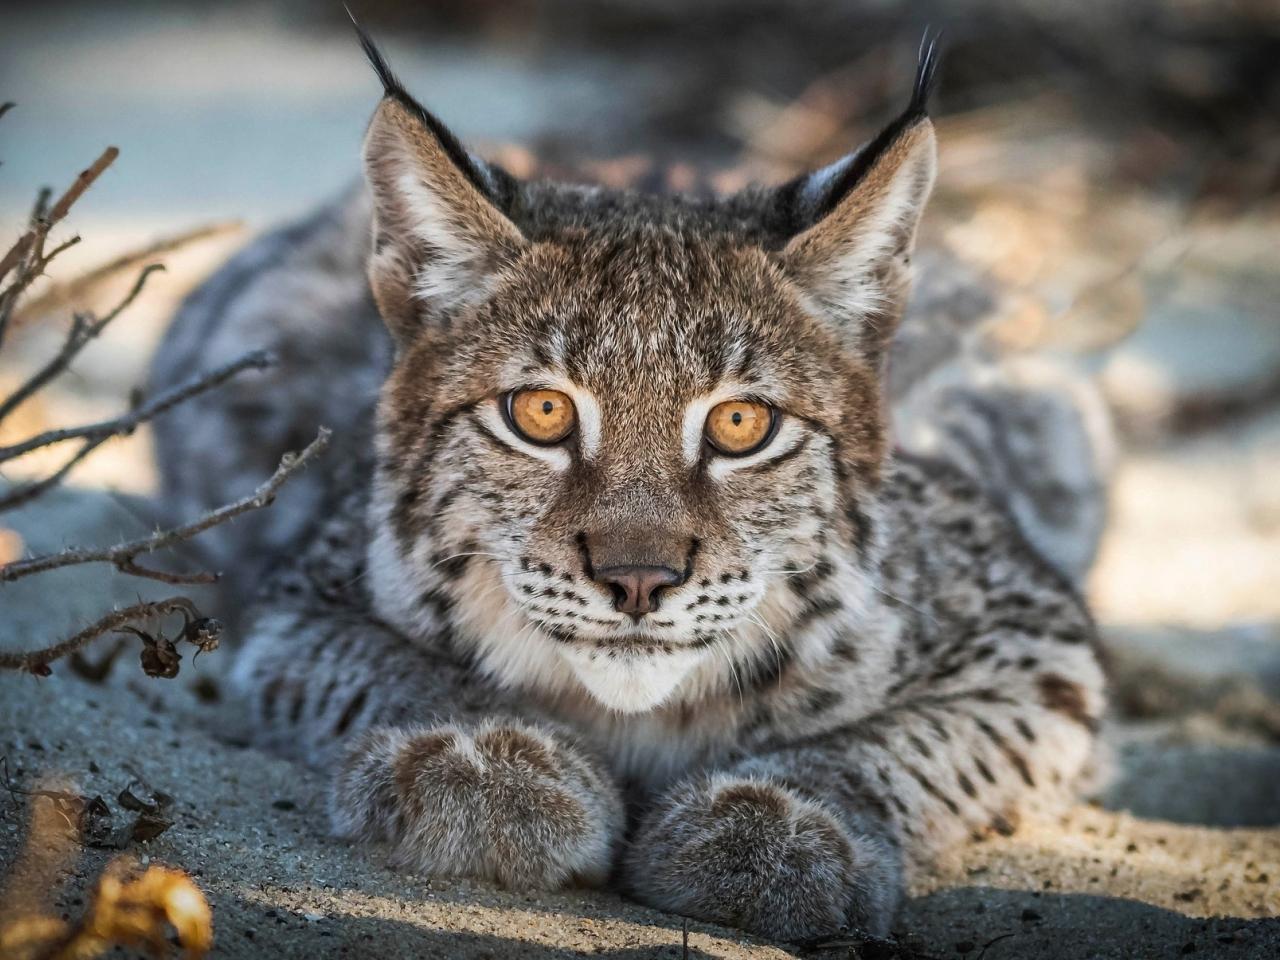 Close up, Lynx, cat, predator, muzzle, 1280x960 wallpaper